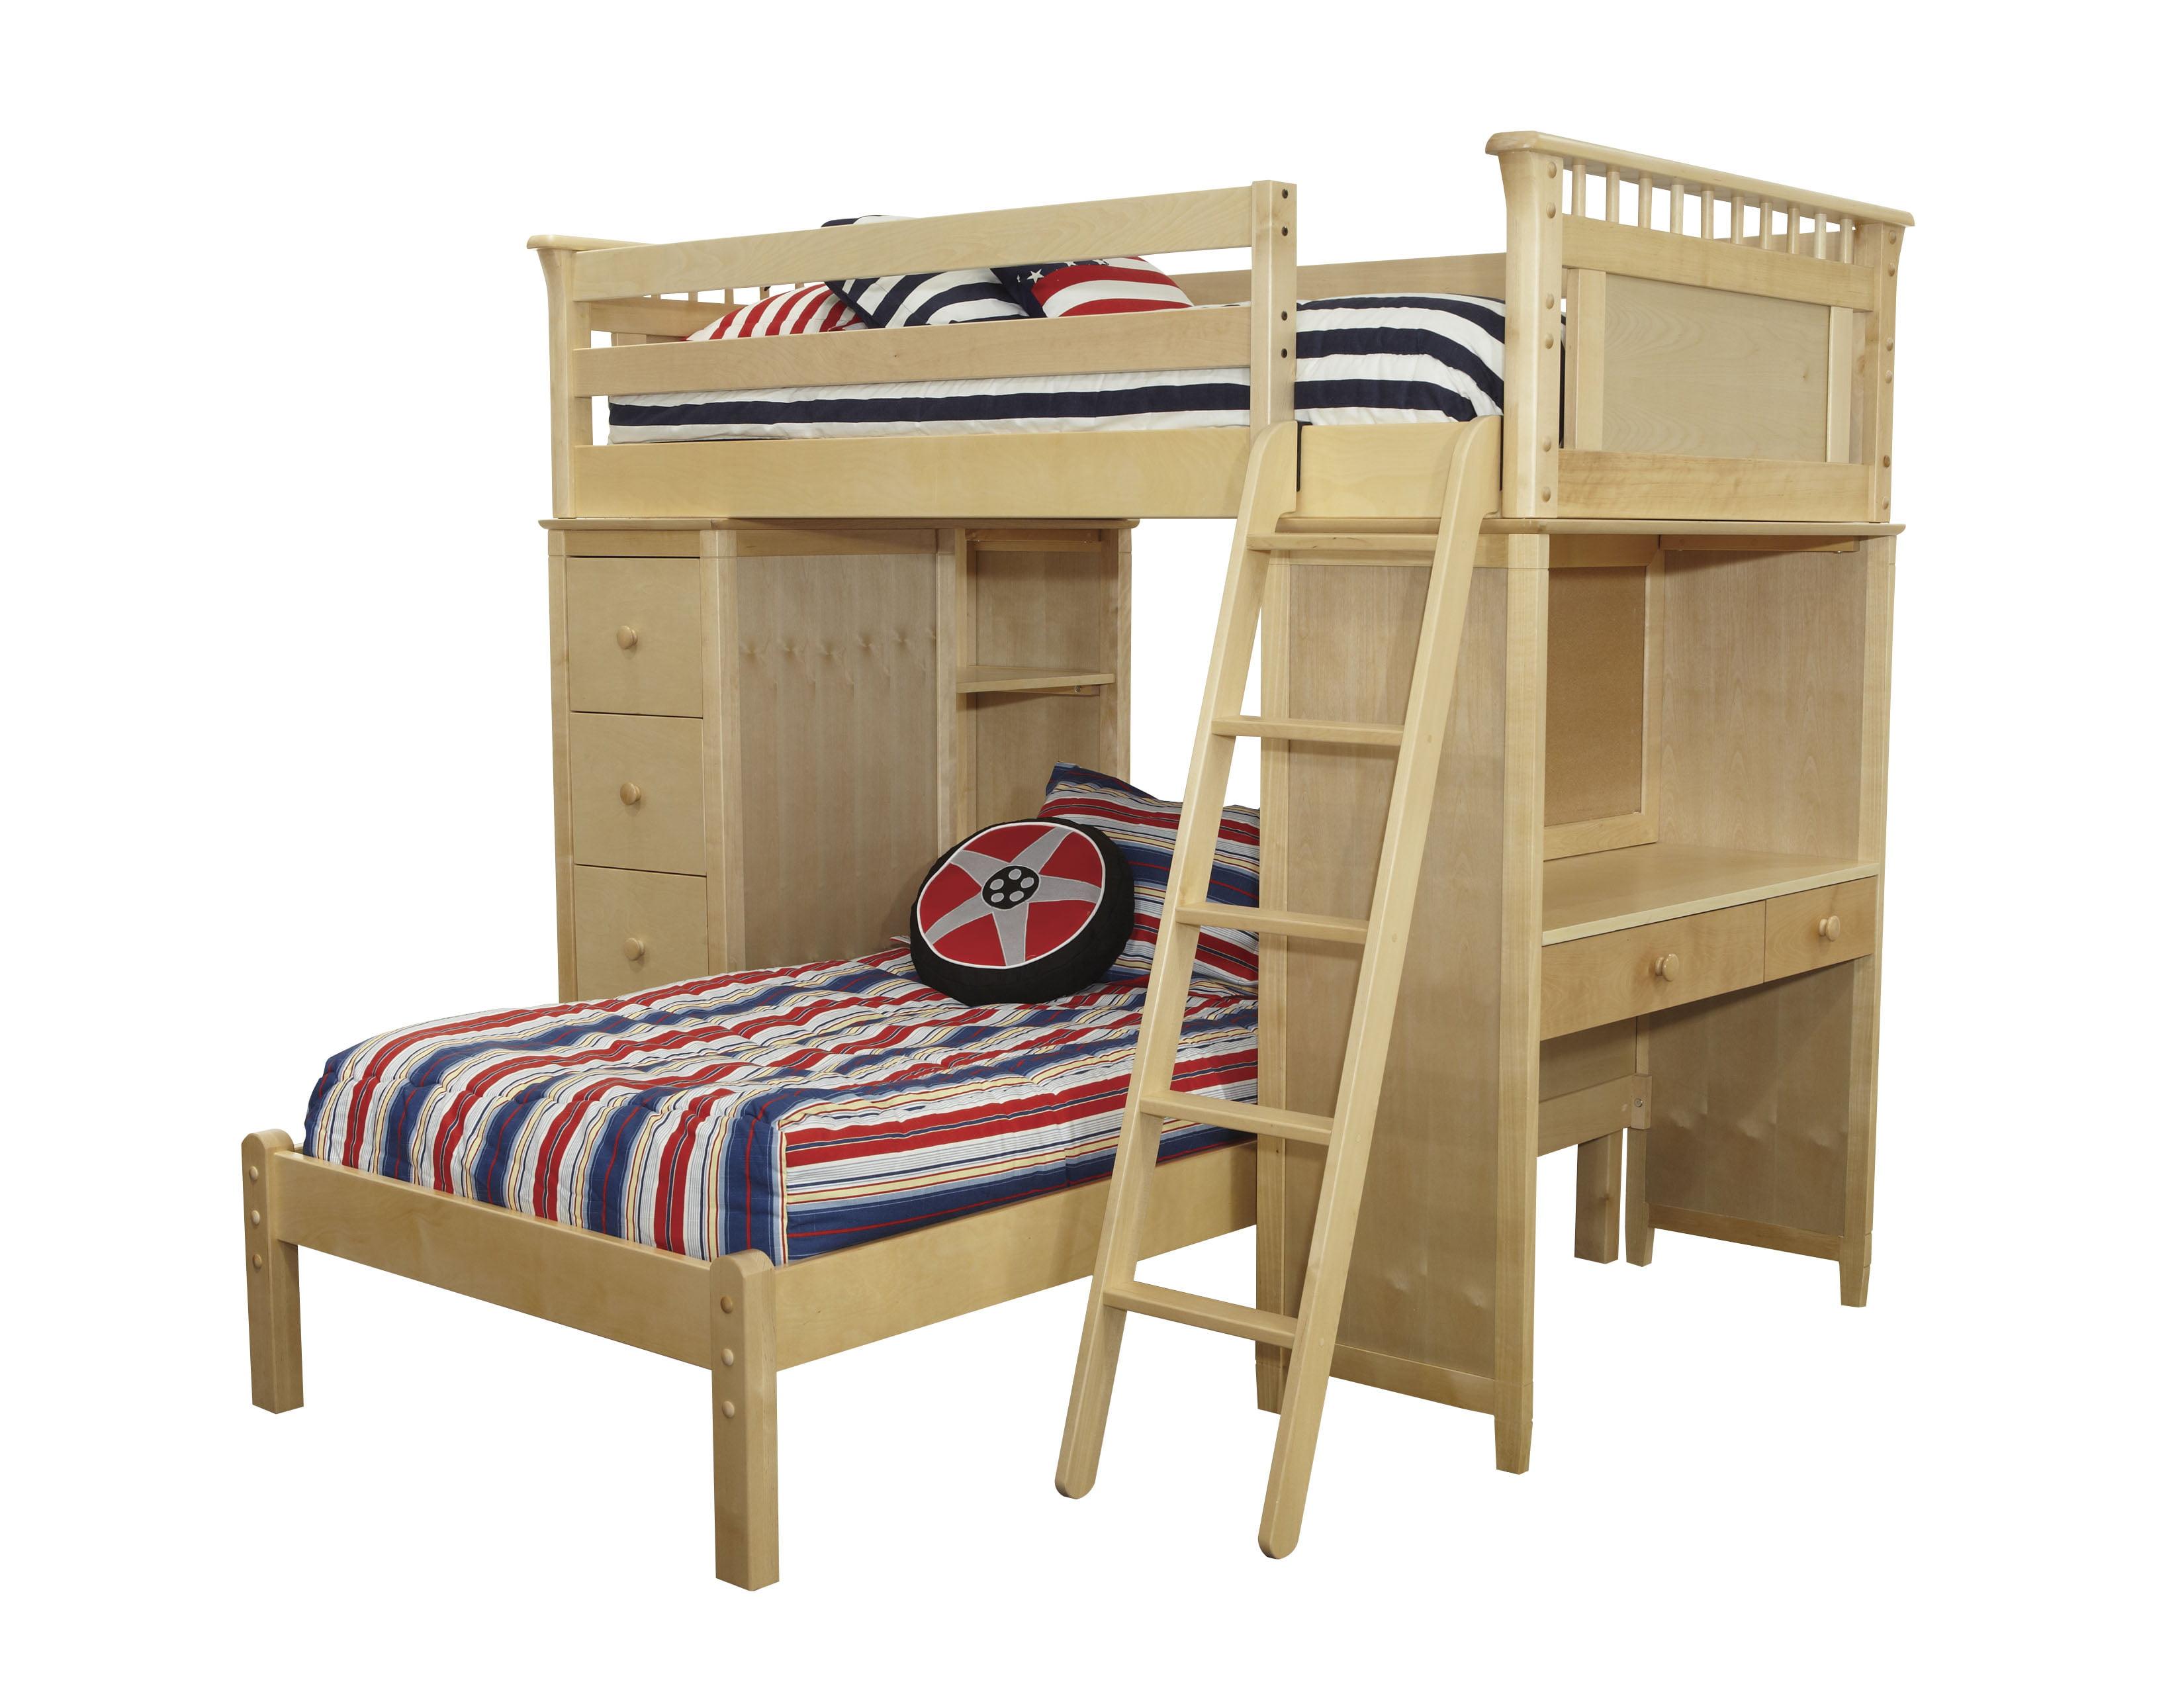 Bennington SSS Loft Bed with Desk, Bookcase, Drawers and Lower Platform Bed, Natural by Bolton Furniture